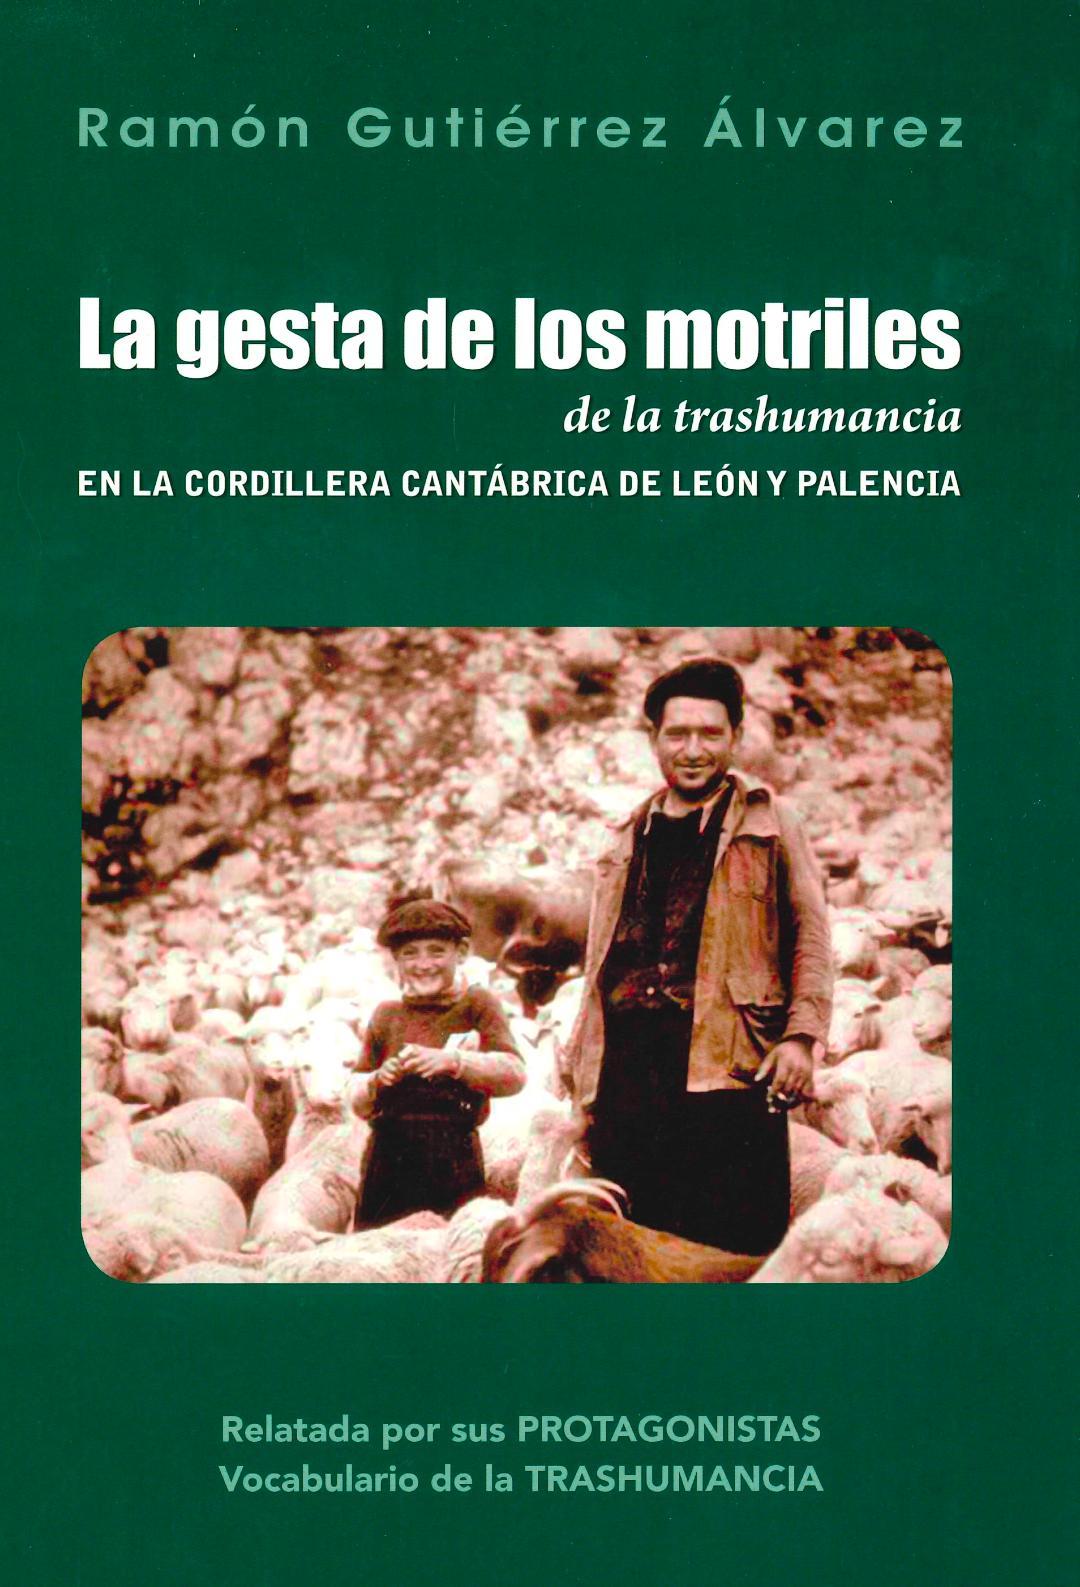 PROMONUMENTA. Presentación libbro de Ramón Gutiérrez